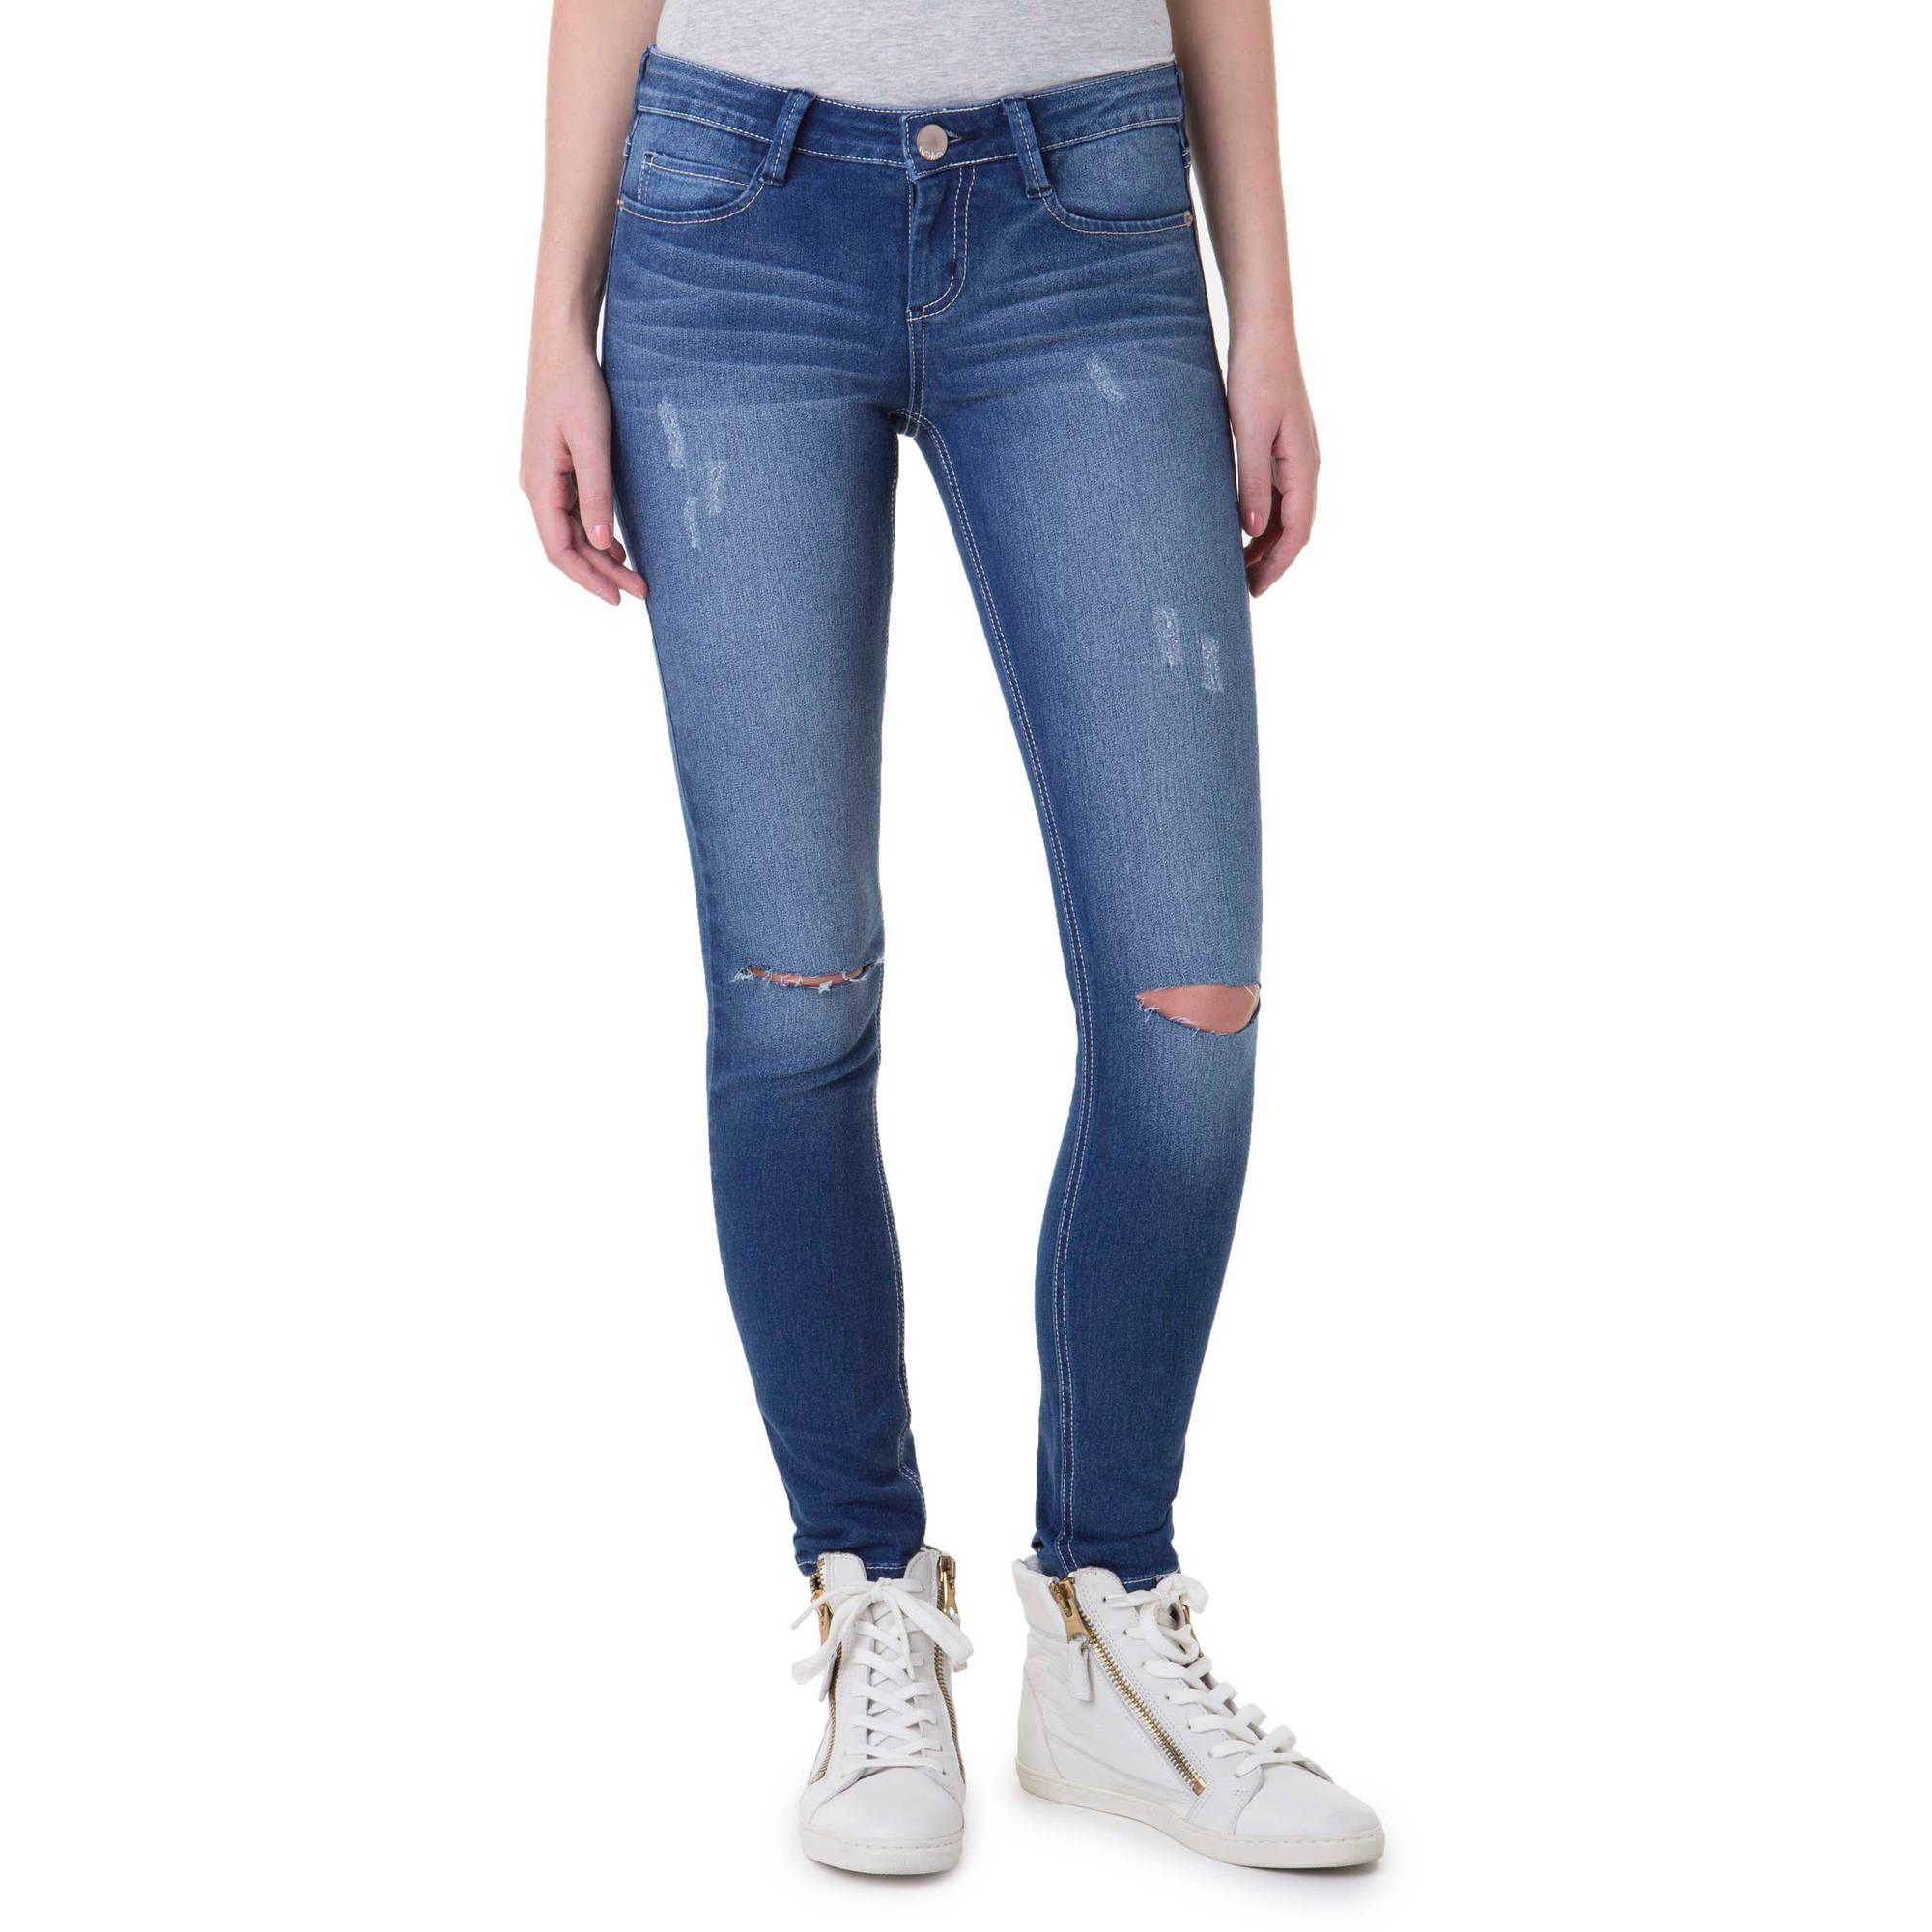 No Boundaries Juniors' Essential Skinny Jeans with Knee Slits